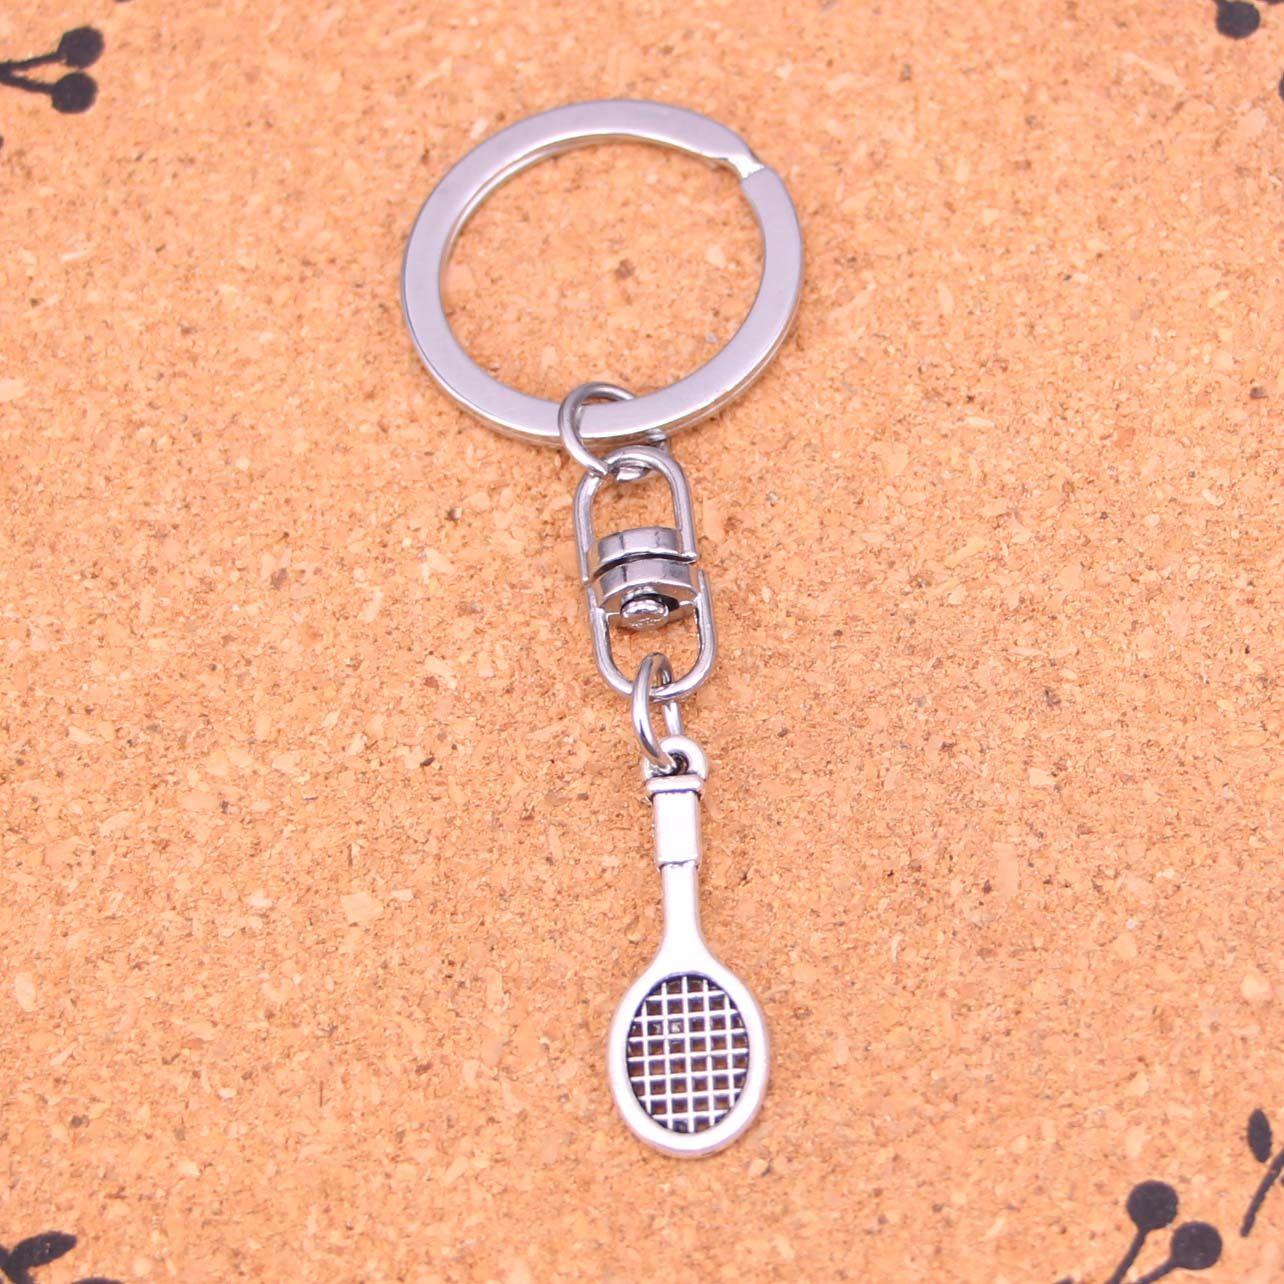 New Design tennis racket Keychain Car Key Chain Key Ring silver pendant For  Man Women Gift bb9c69d44